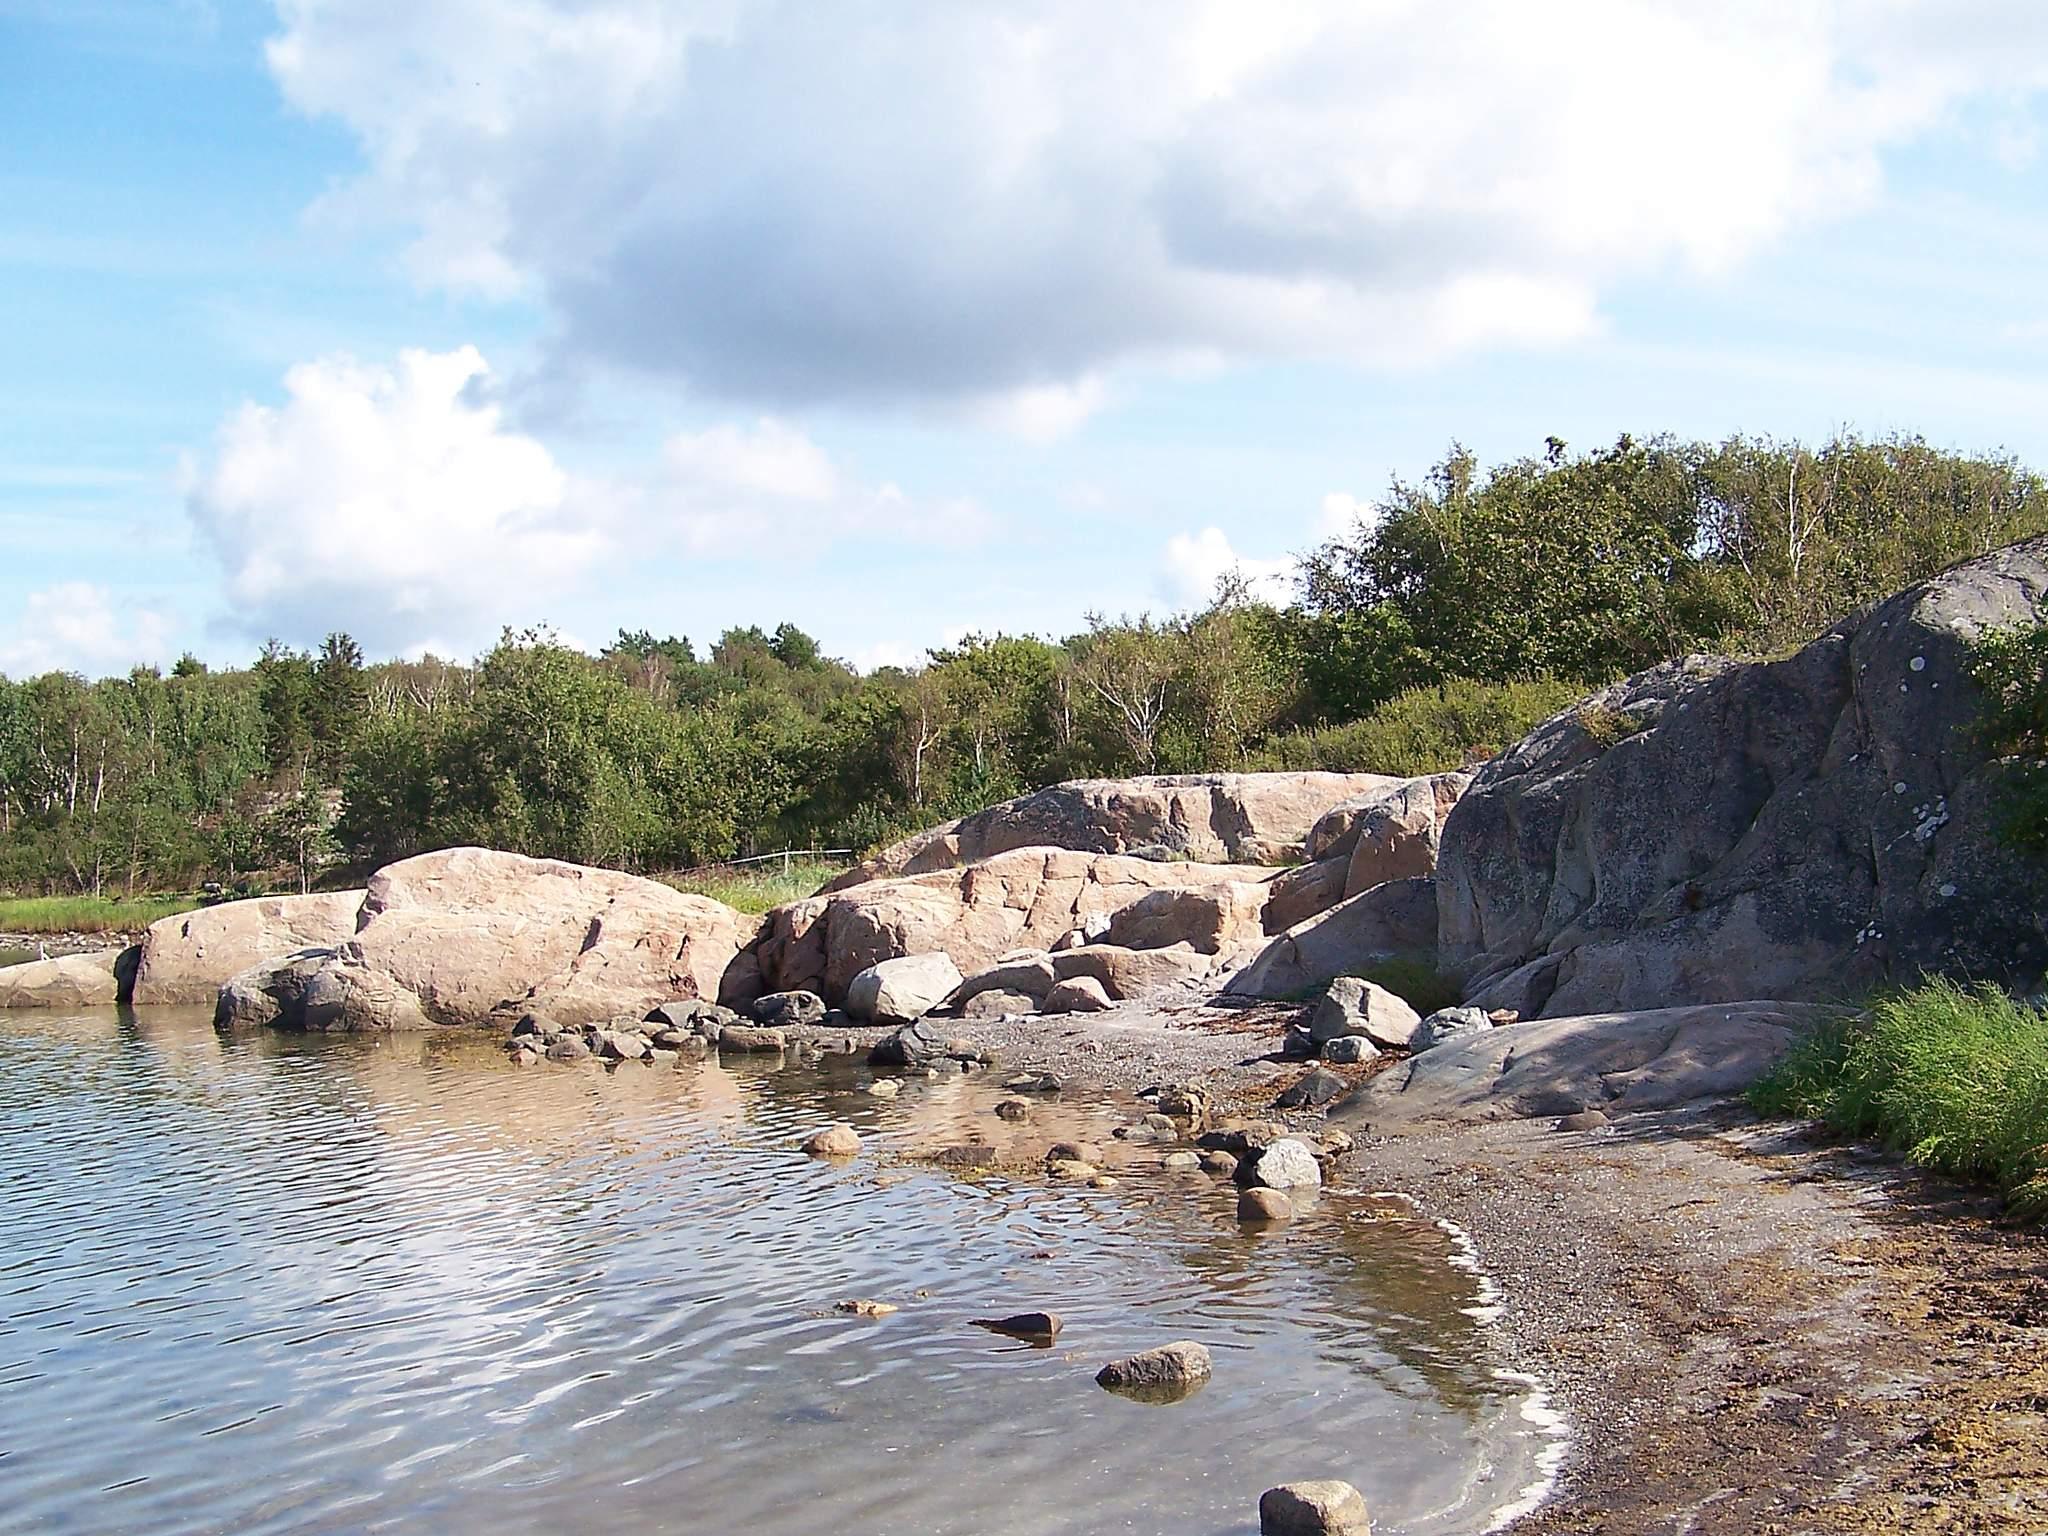 Ferienhaus Tjörn/Huseberg (672440), Kållekärr, Tjörn, Westschweden, Schweden, Bild 17